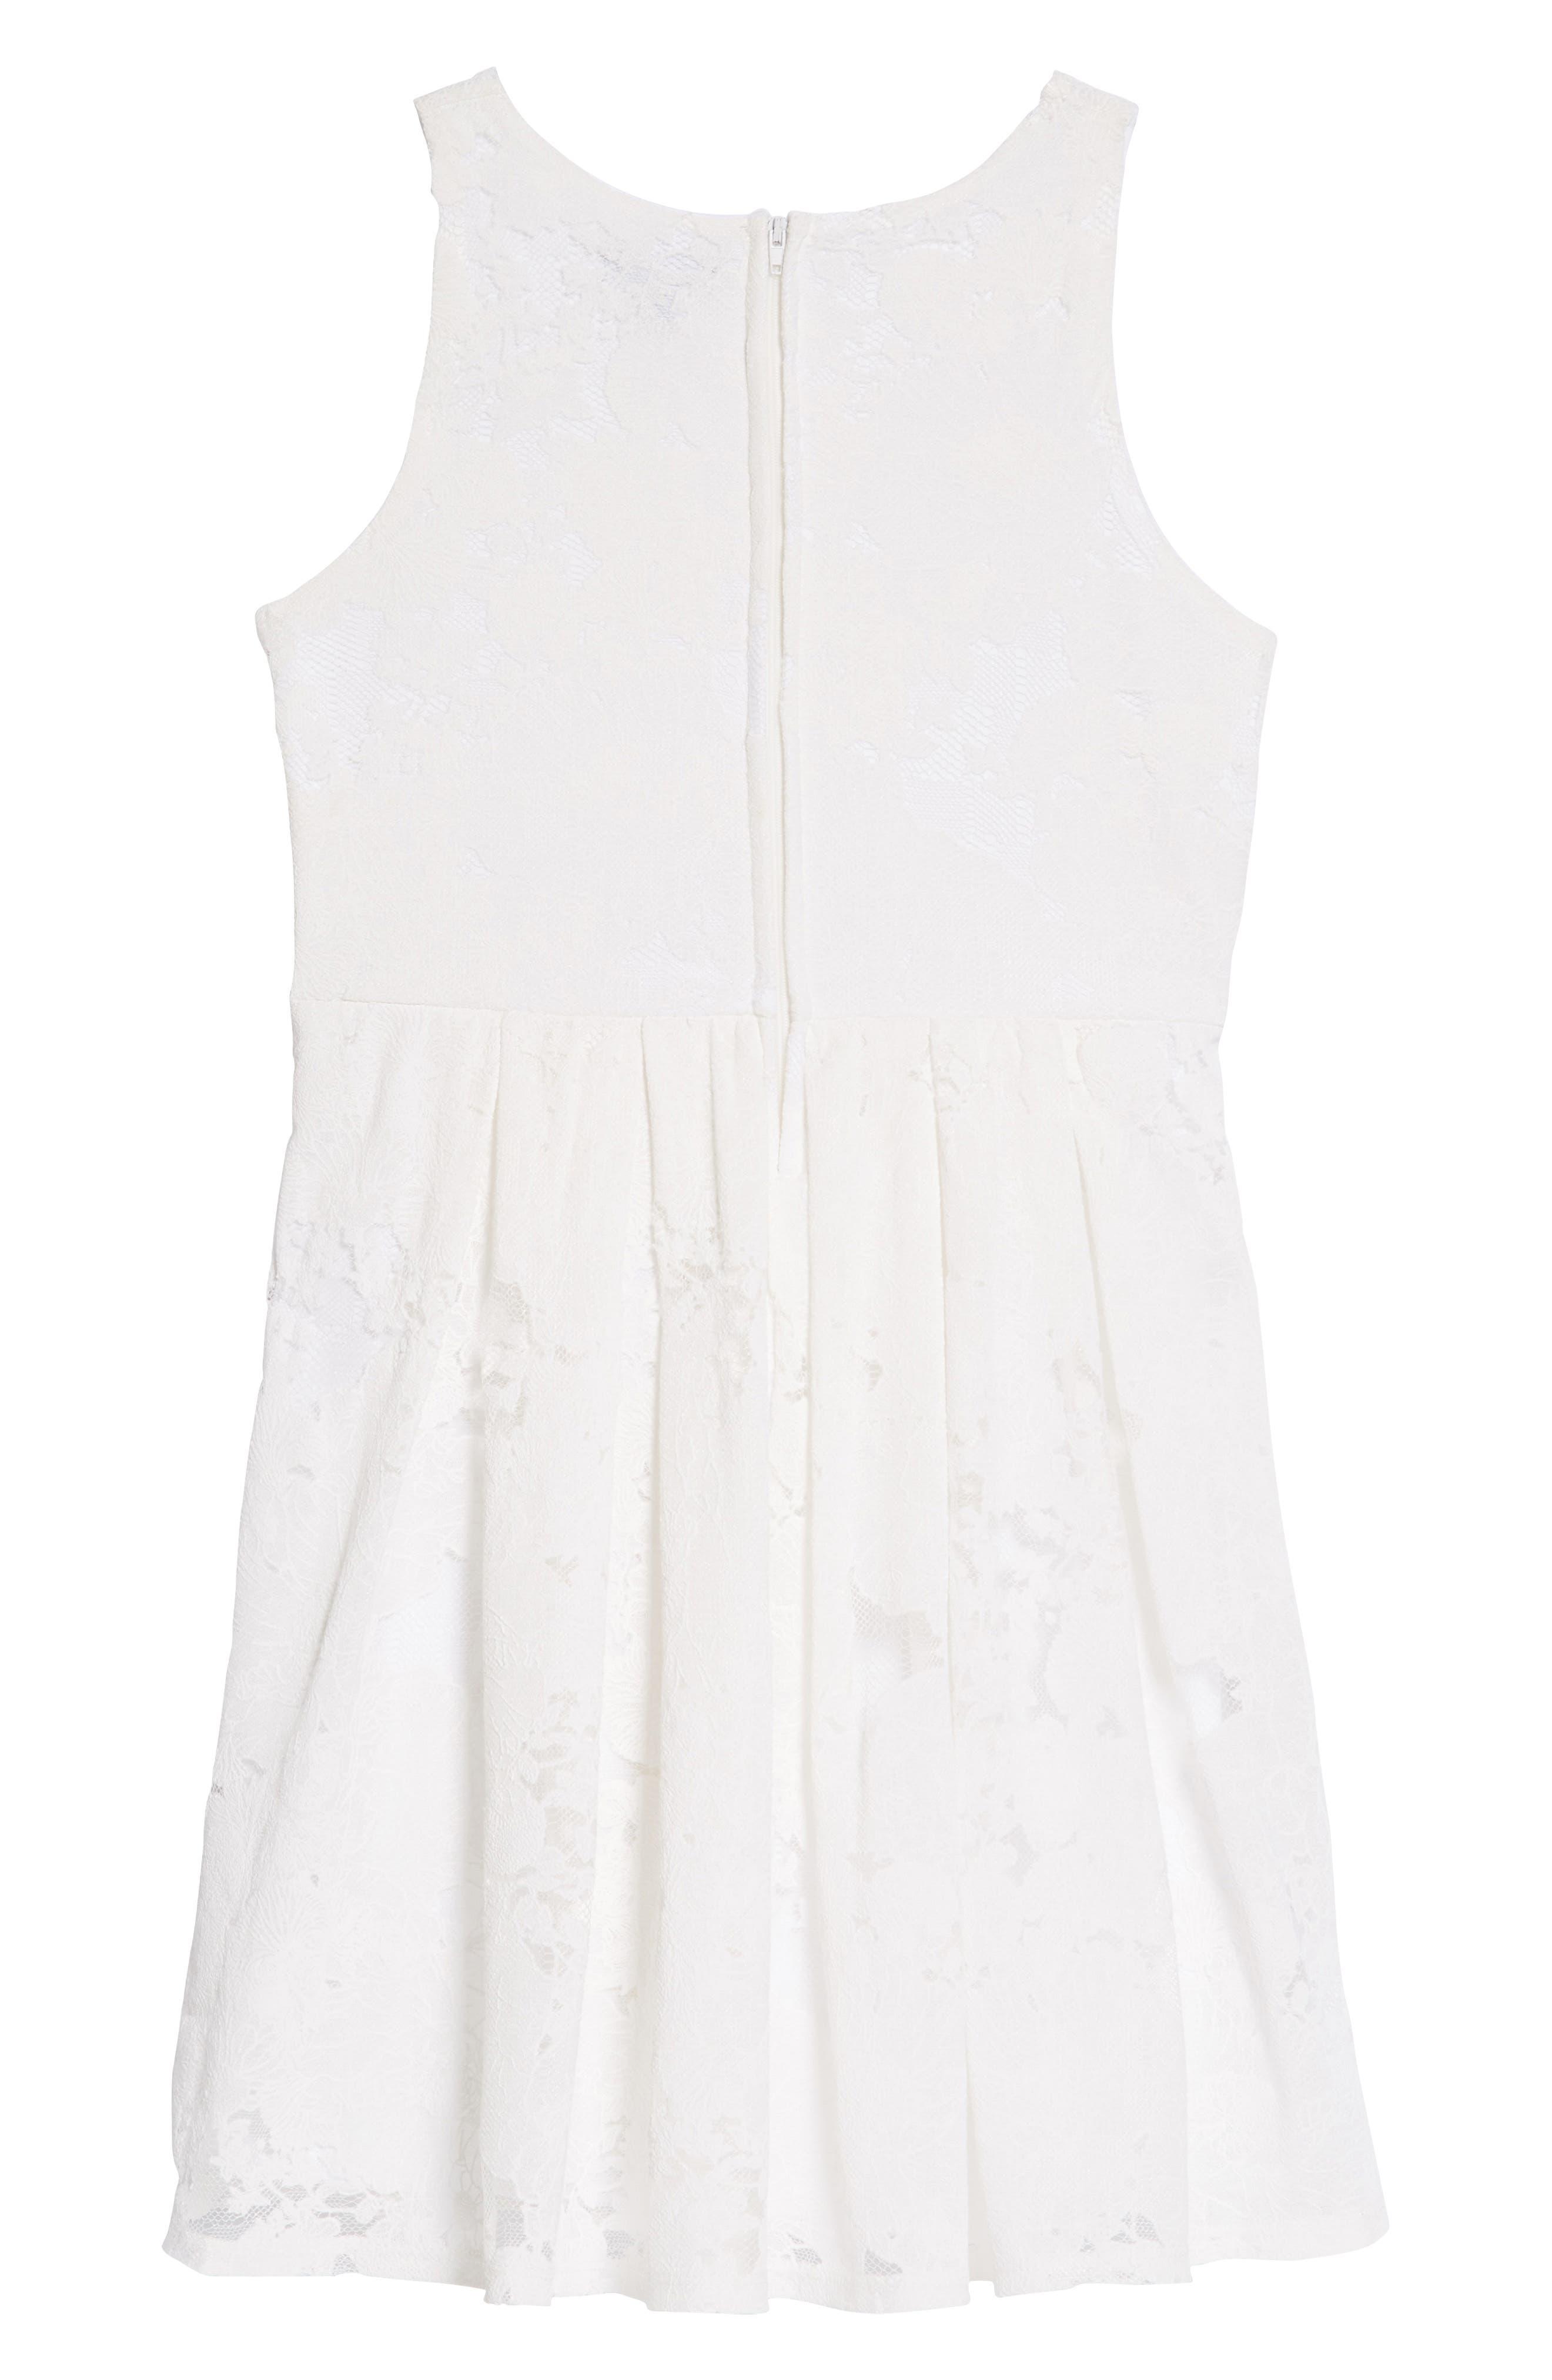 Lace Overlay Skater Dress,                             Alternate thumbnail 2, color,                             100